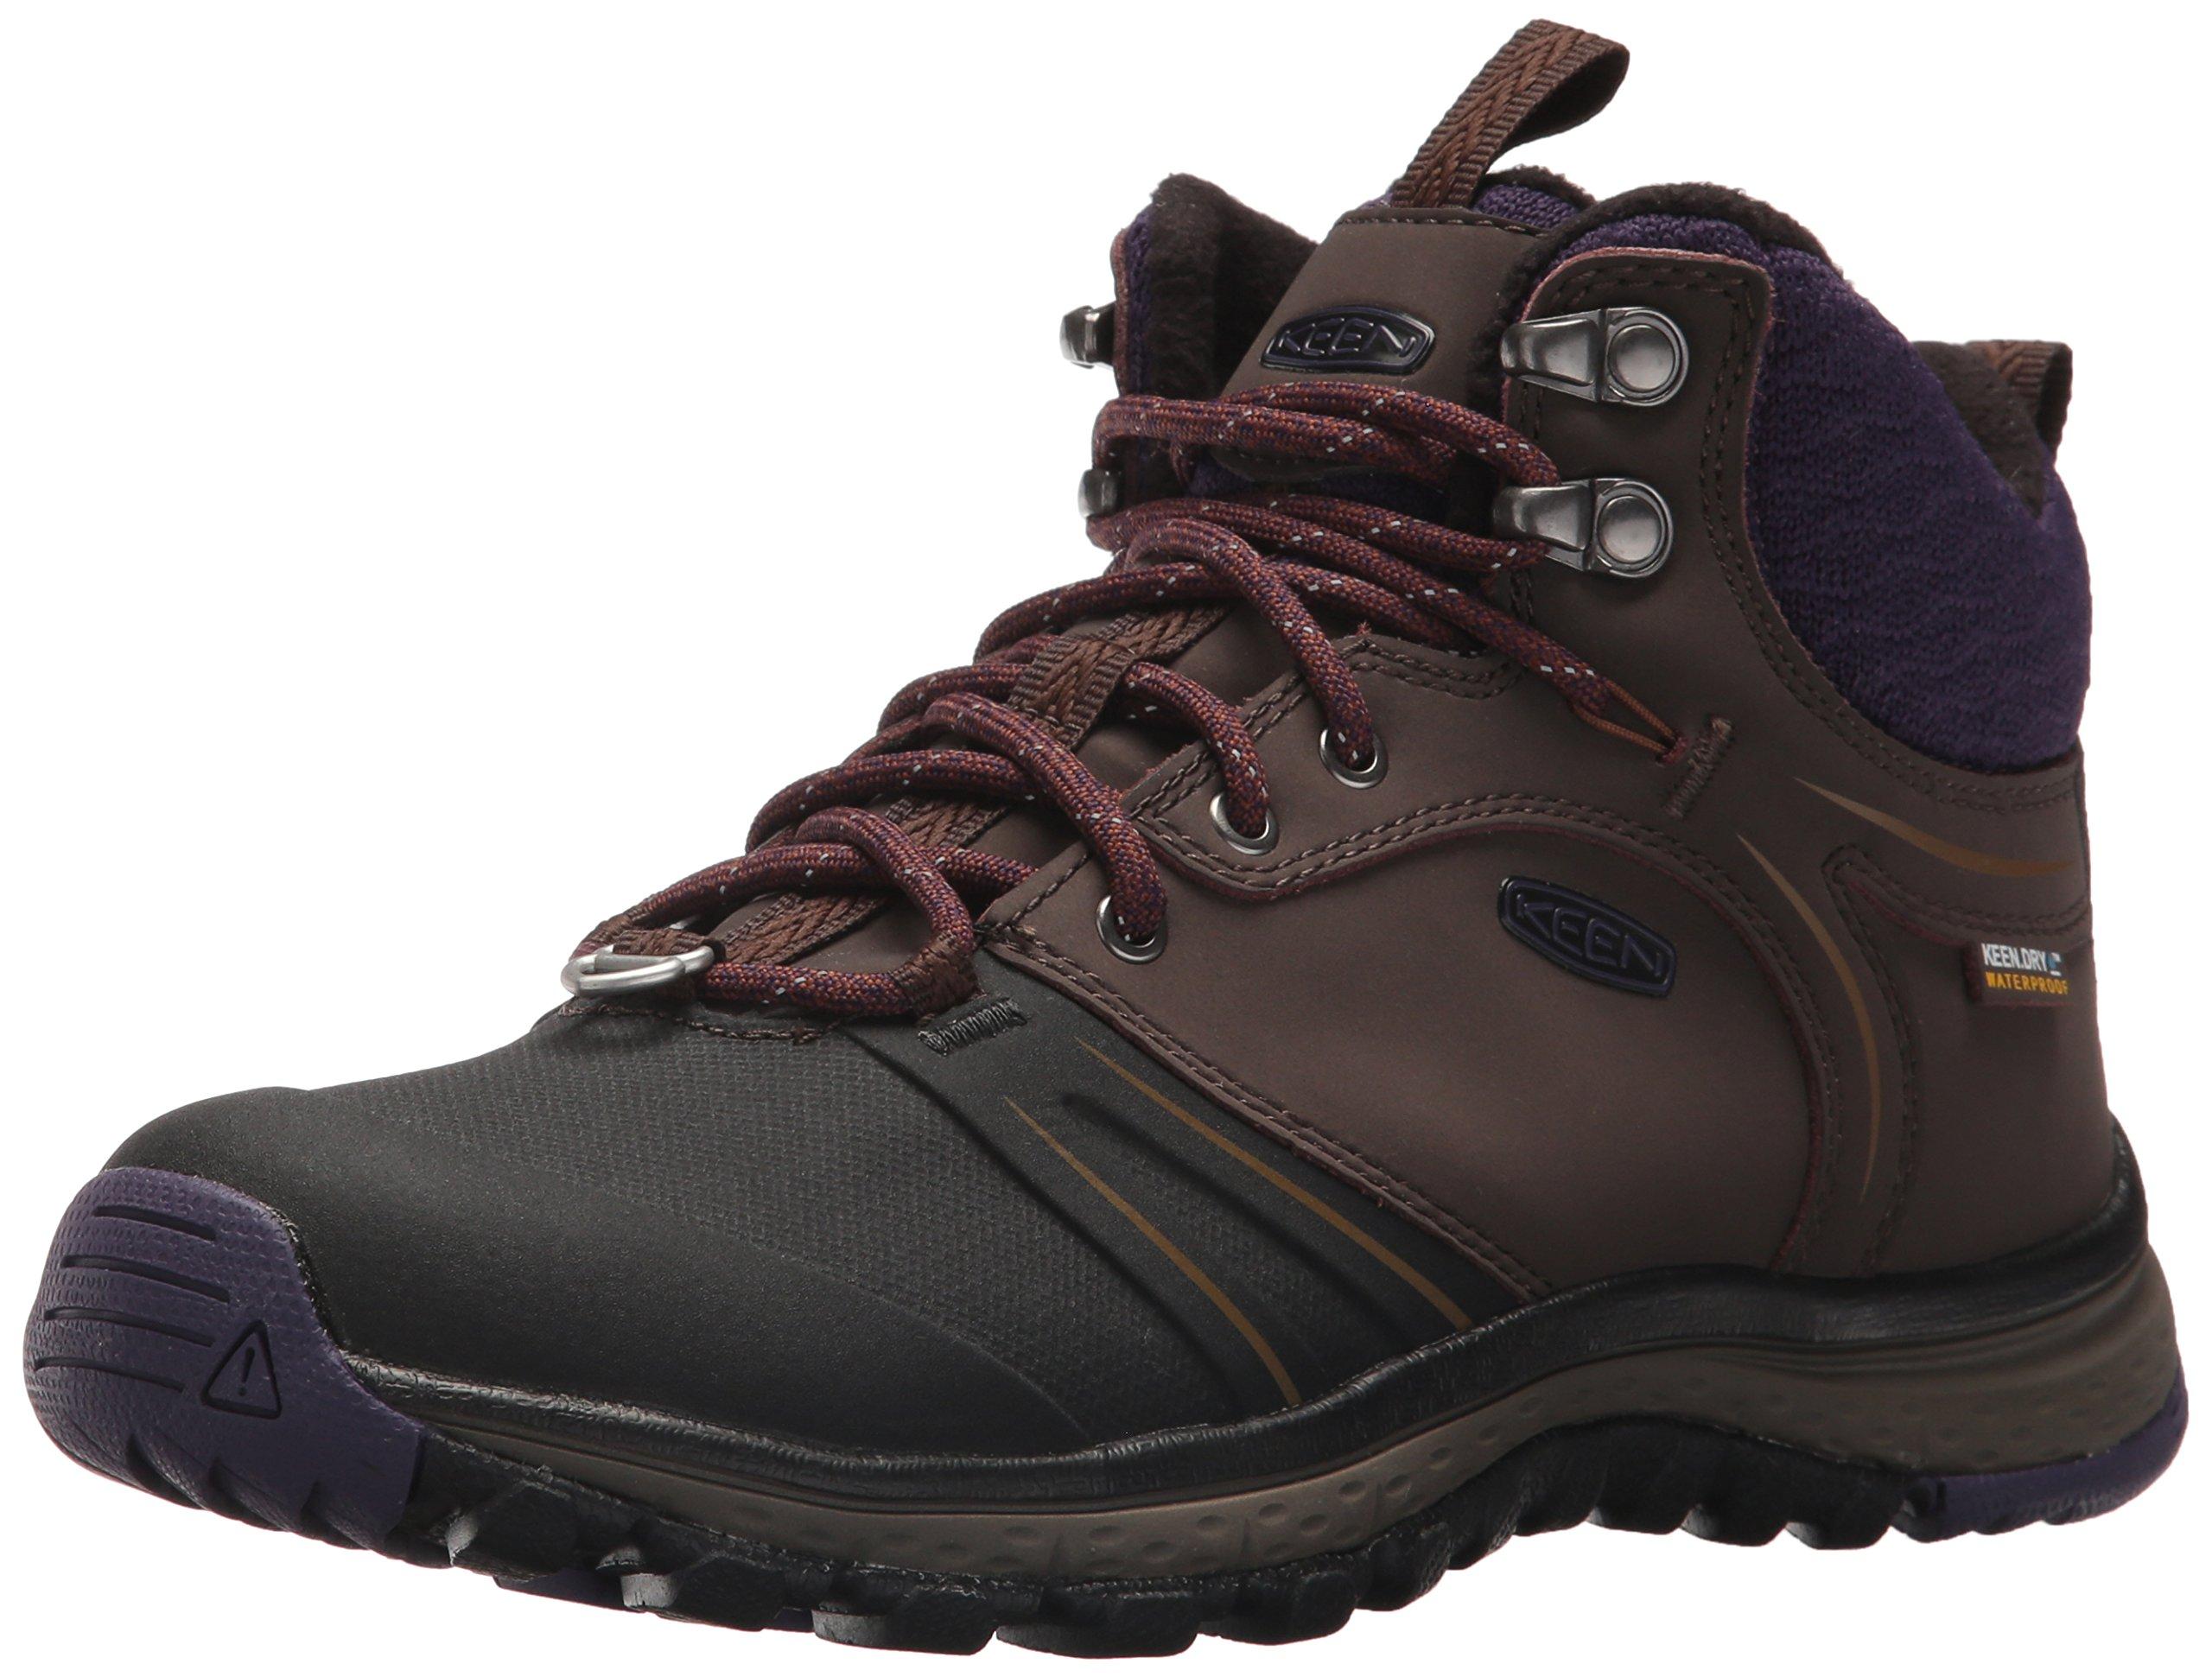 KEEN Women's Terradora Wintershell-w Hiking Shoe, Mulch/Plum Plumeria, 7 M US